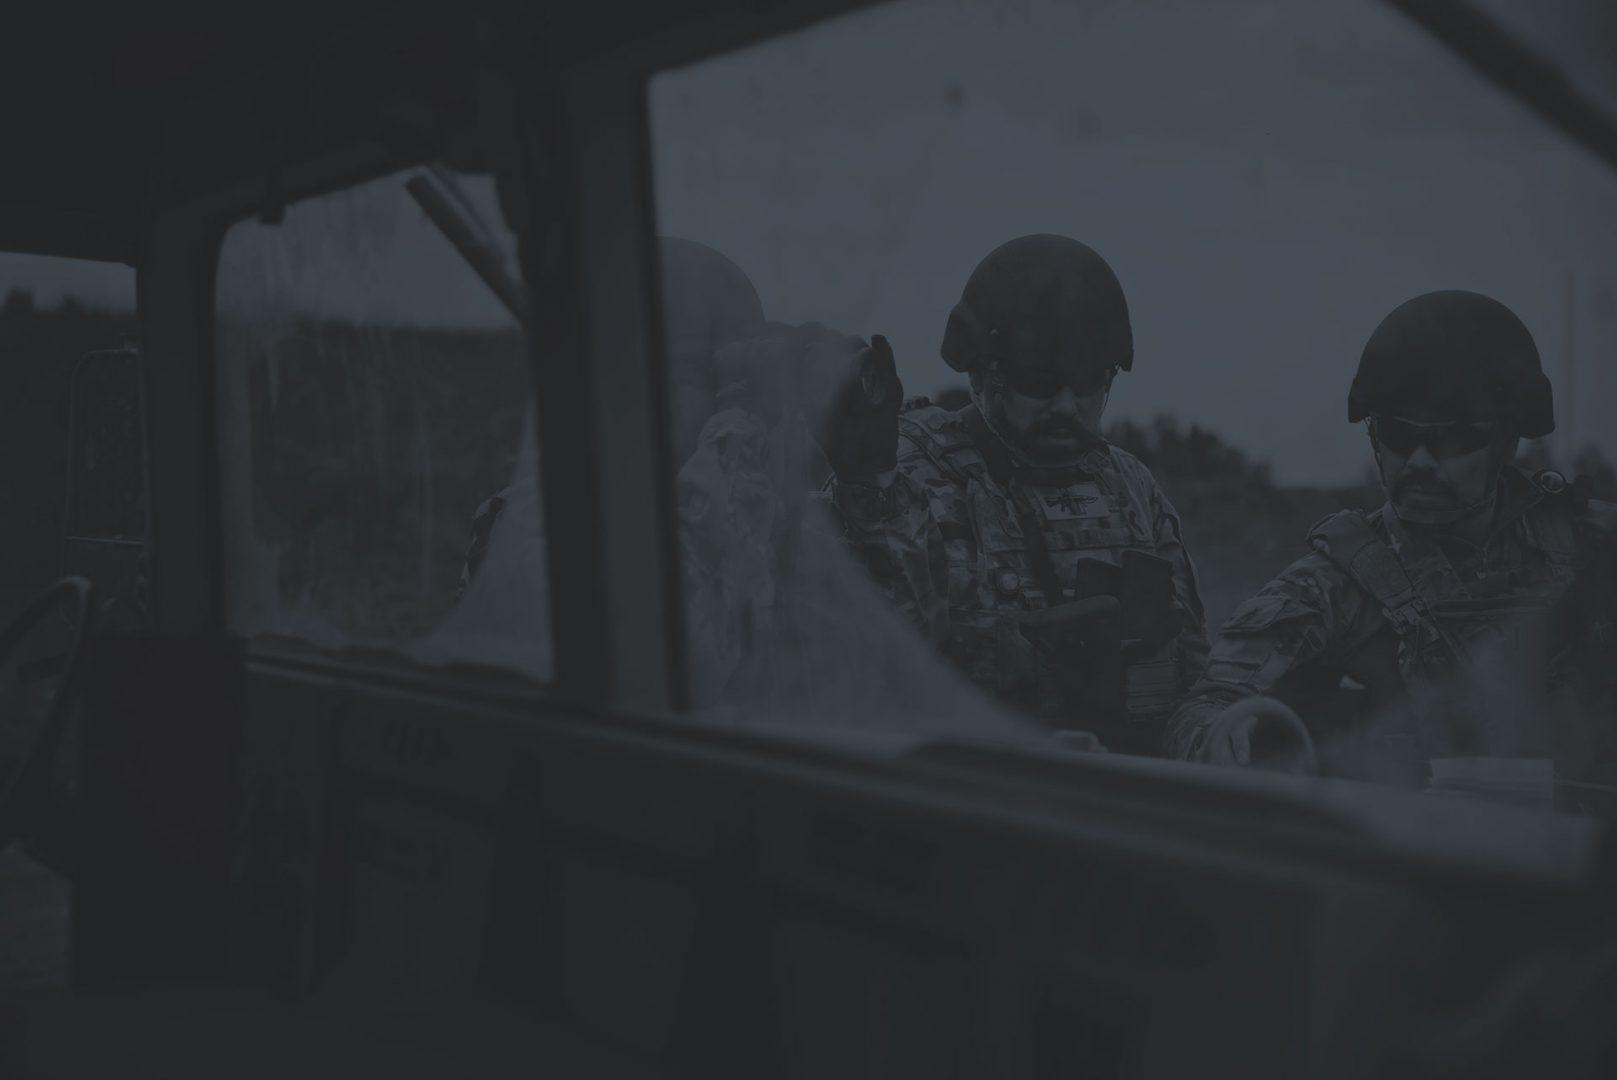 Soldiers Wearing LASA AC914 Ballistic Helmet Dark Duotone